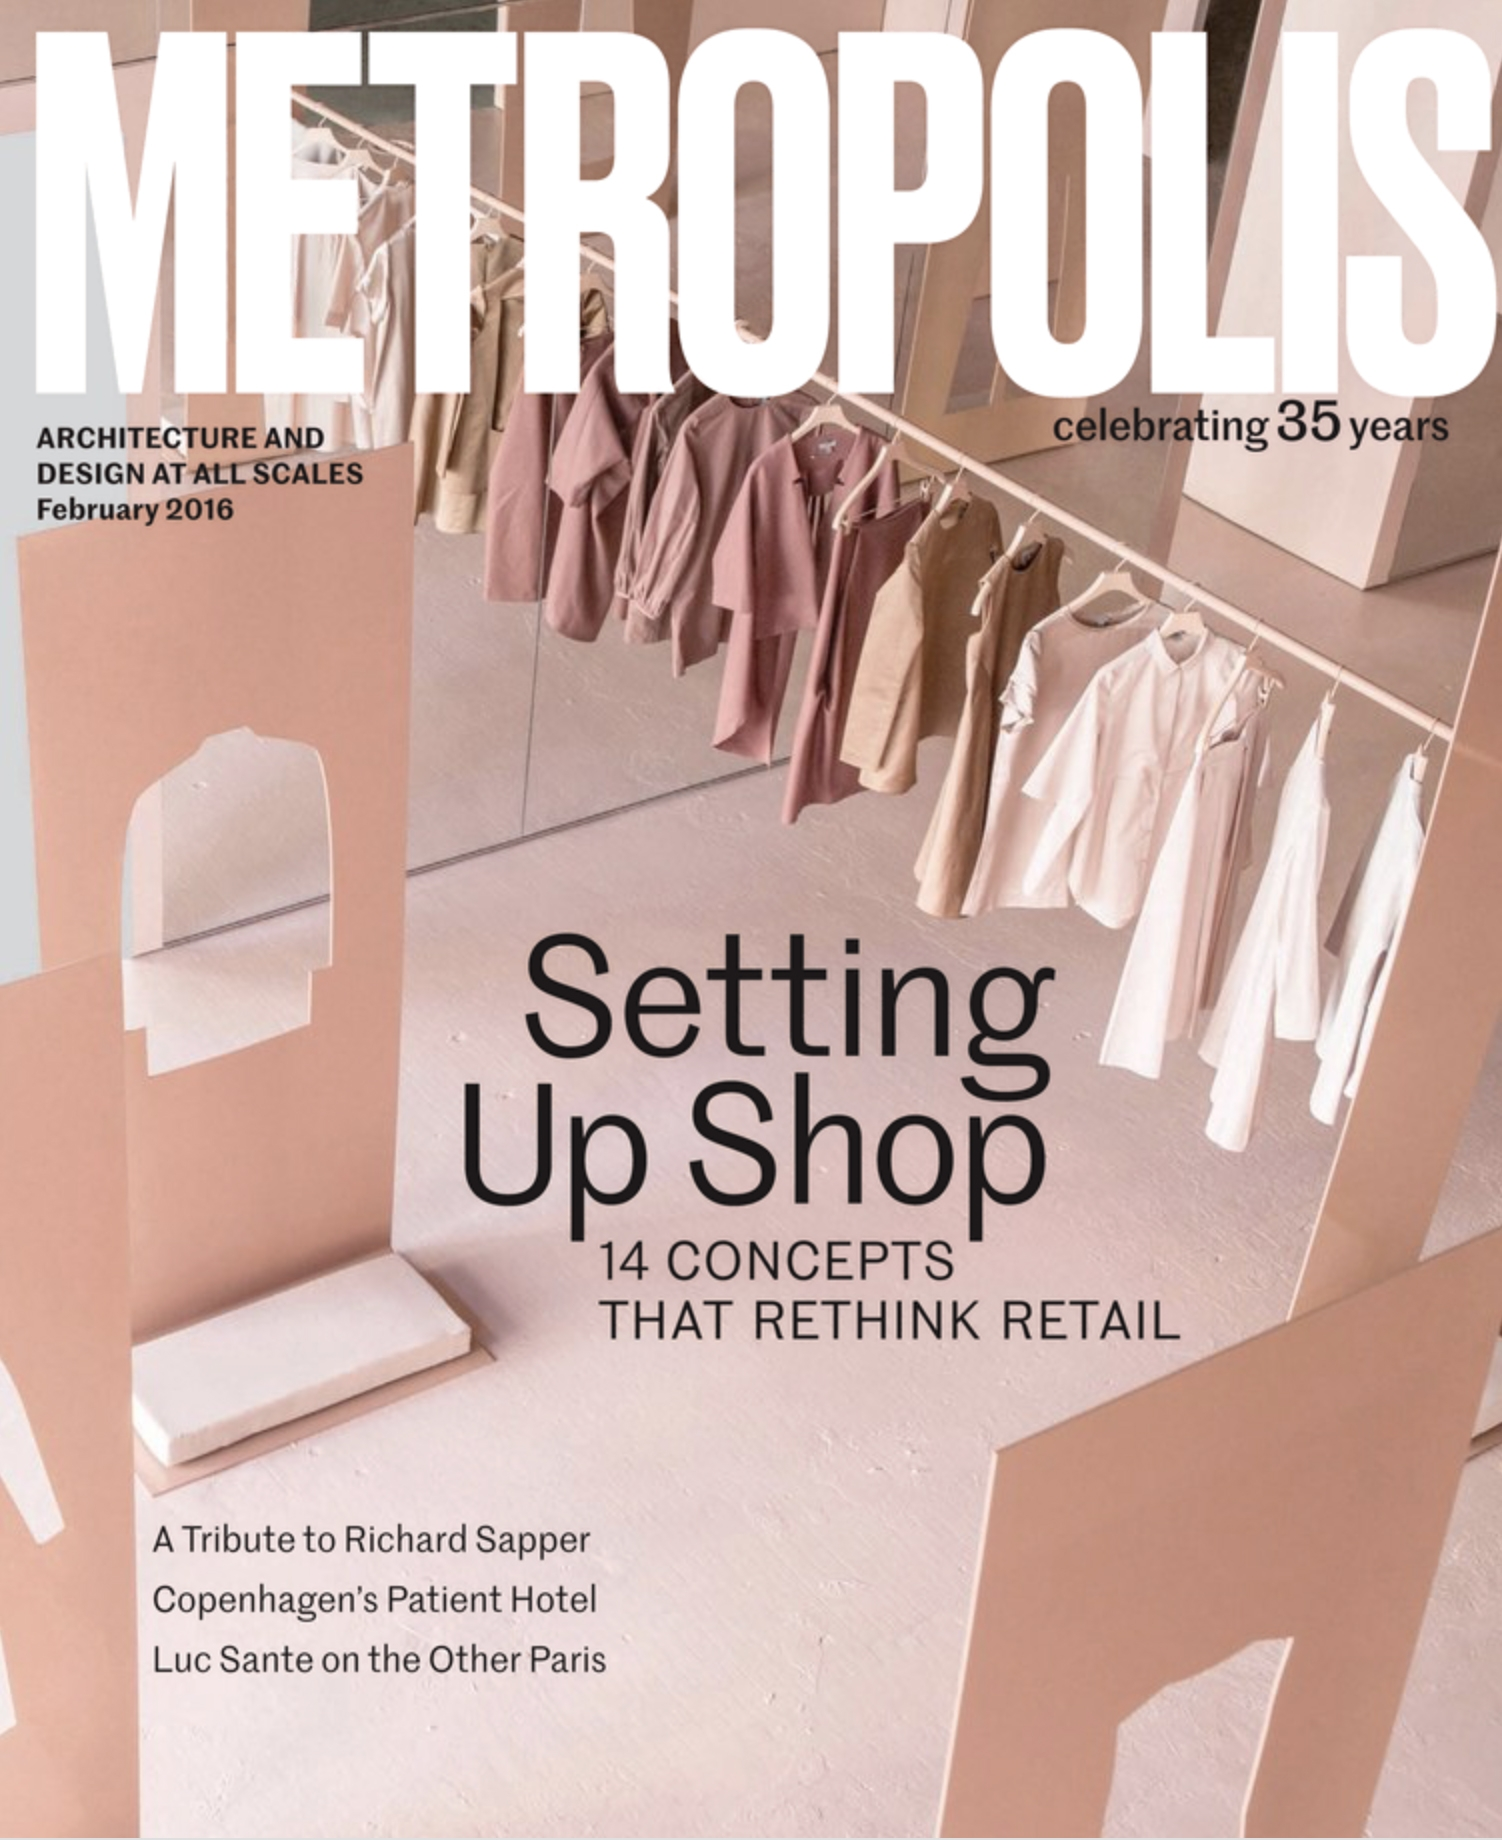 70.-METROPOLIS Cover-February-2016 copy.jpg